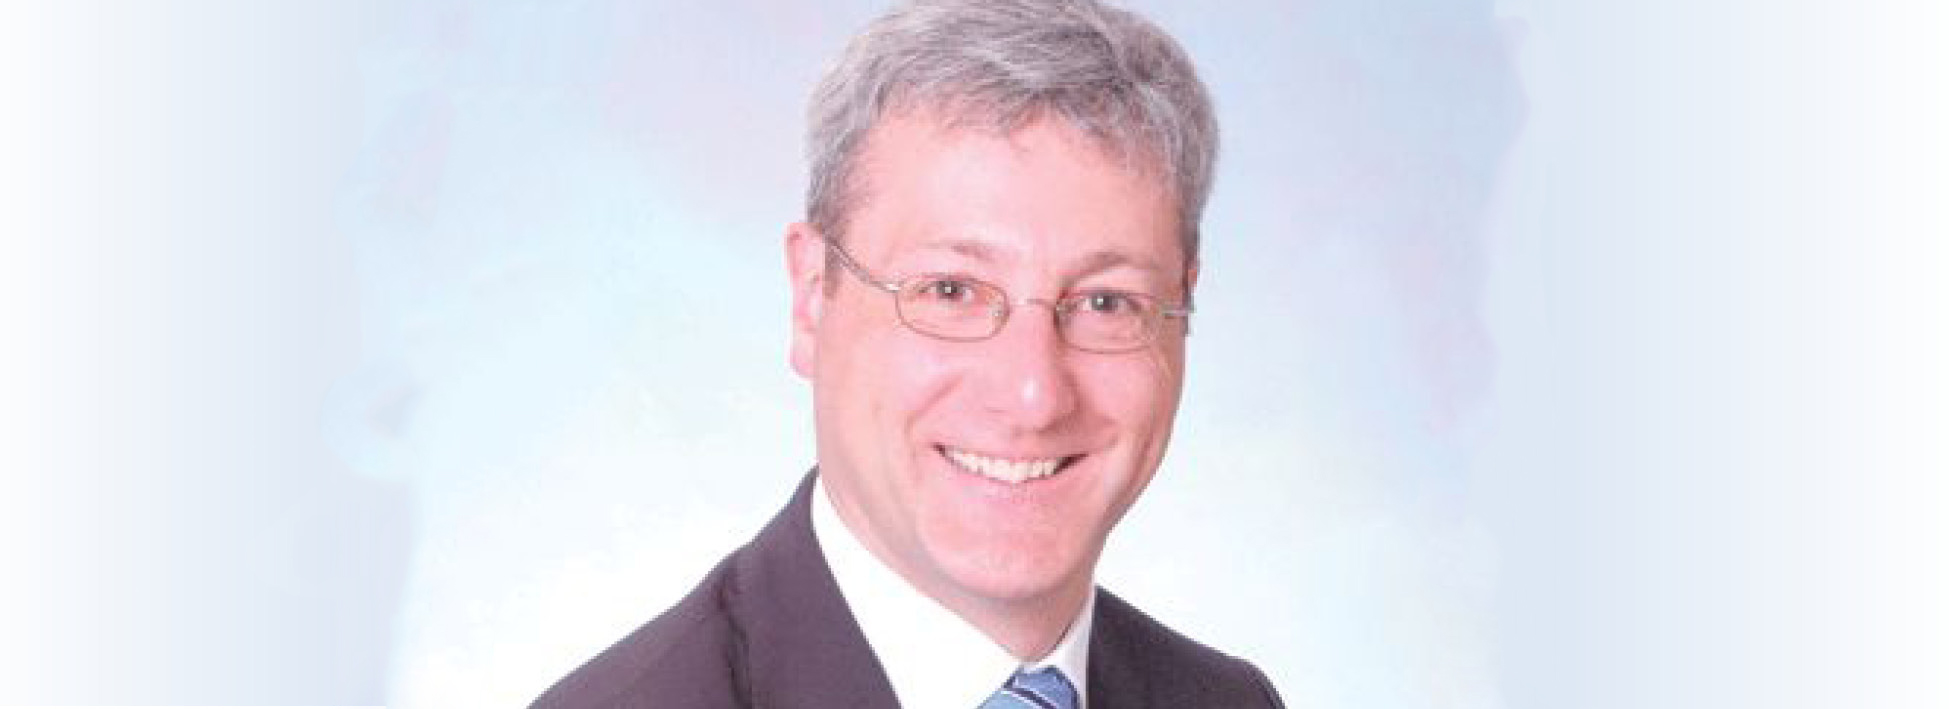 Richard Boivin